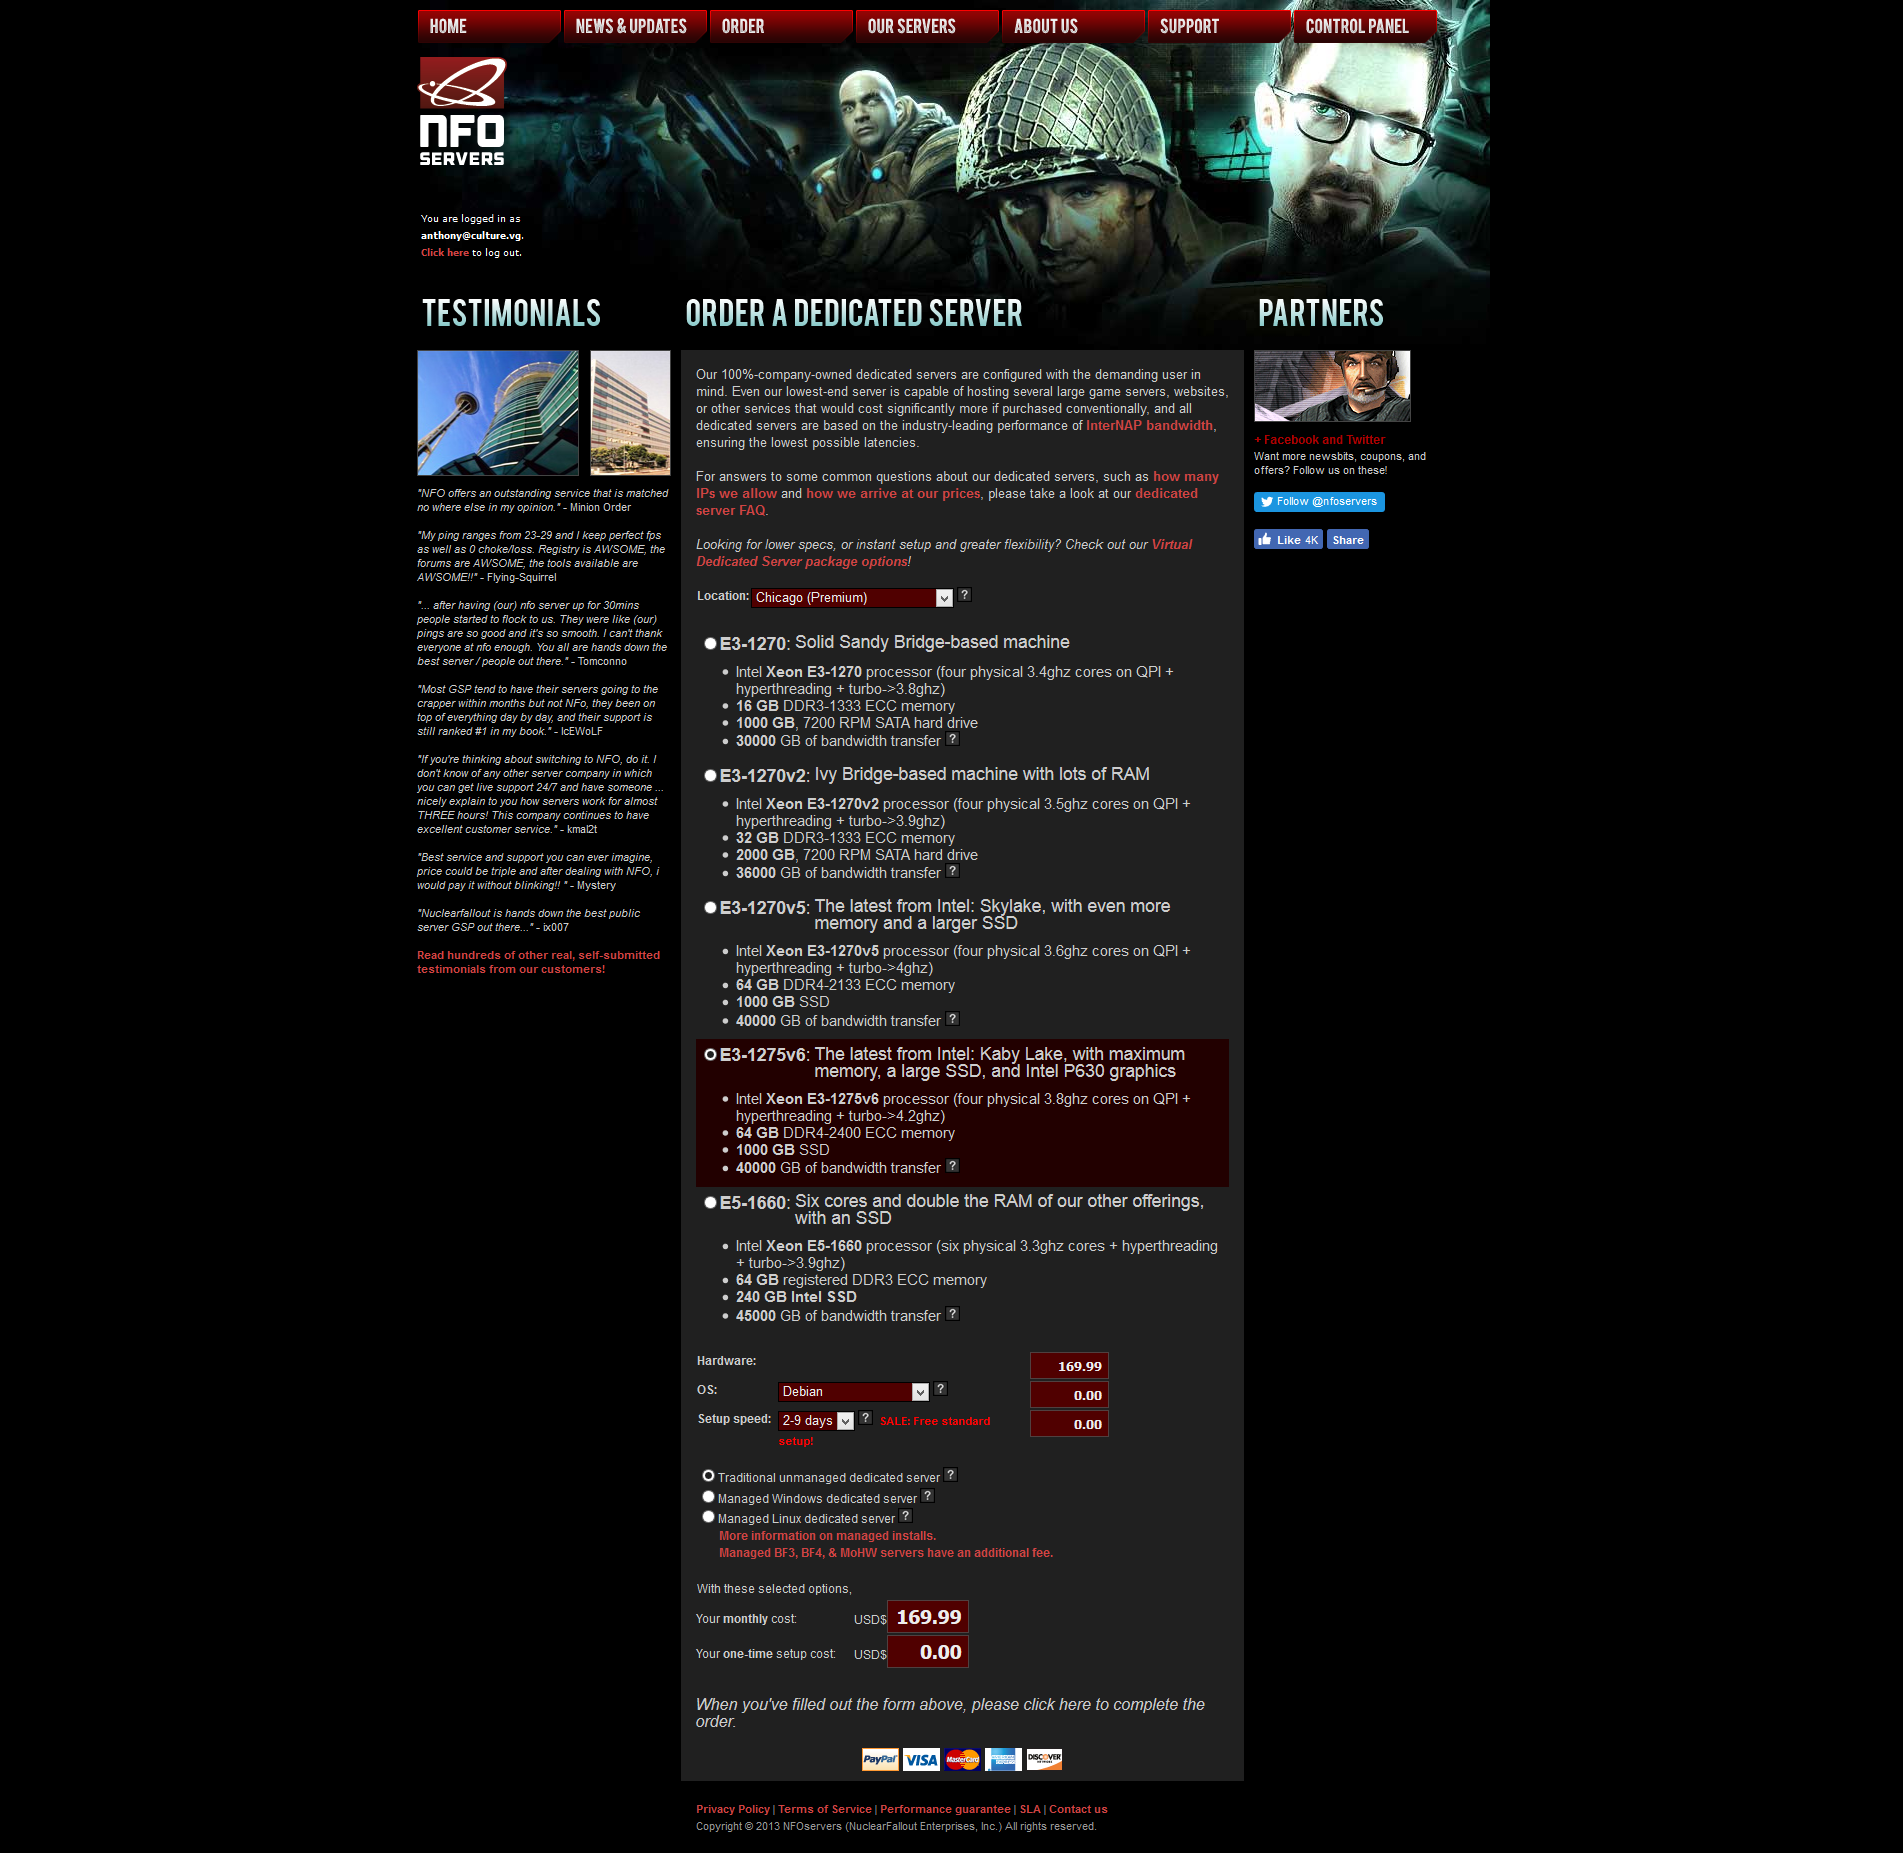 Screenshot-2017-12-16 Game Server Rentals and Hosting Dedicated servers order page NFOservers.png